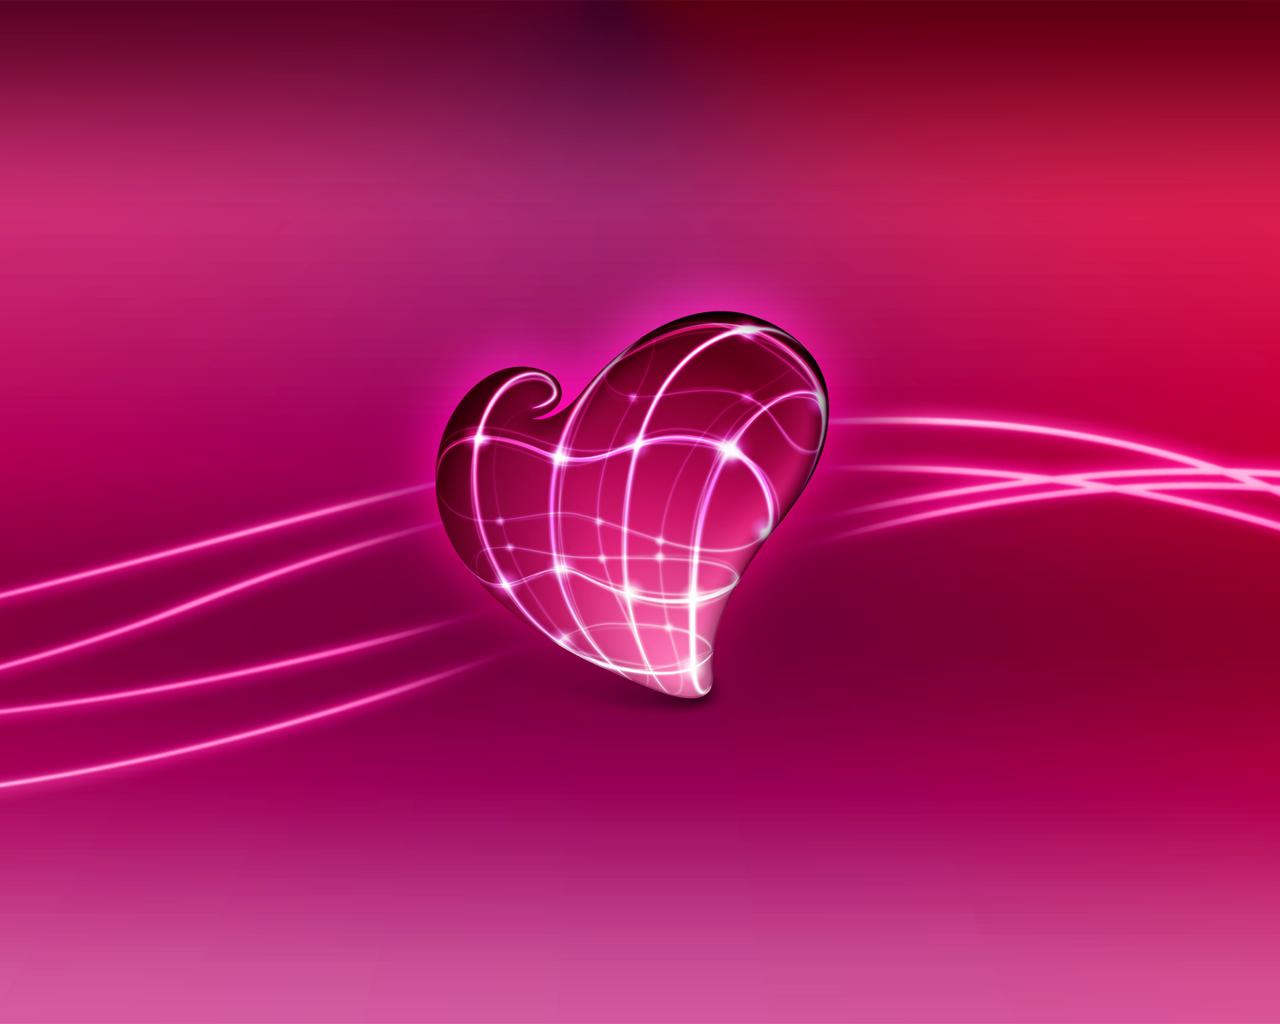 Pretty Pink Wallpaper wallpaper wallpaper hd background desktop 1280x1024